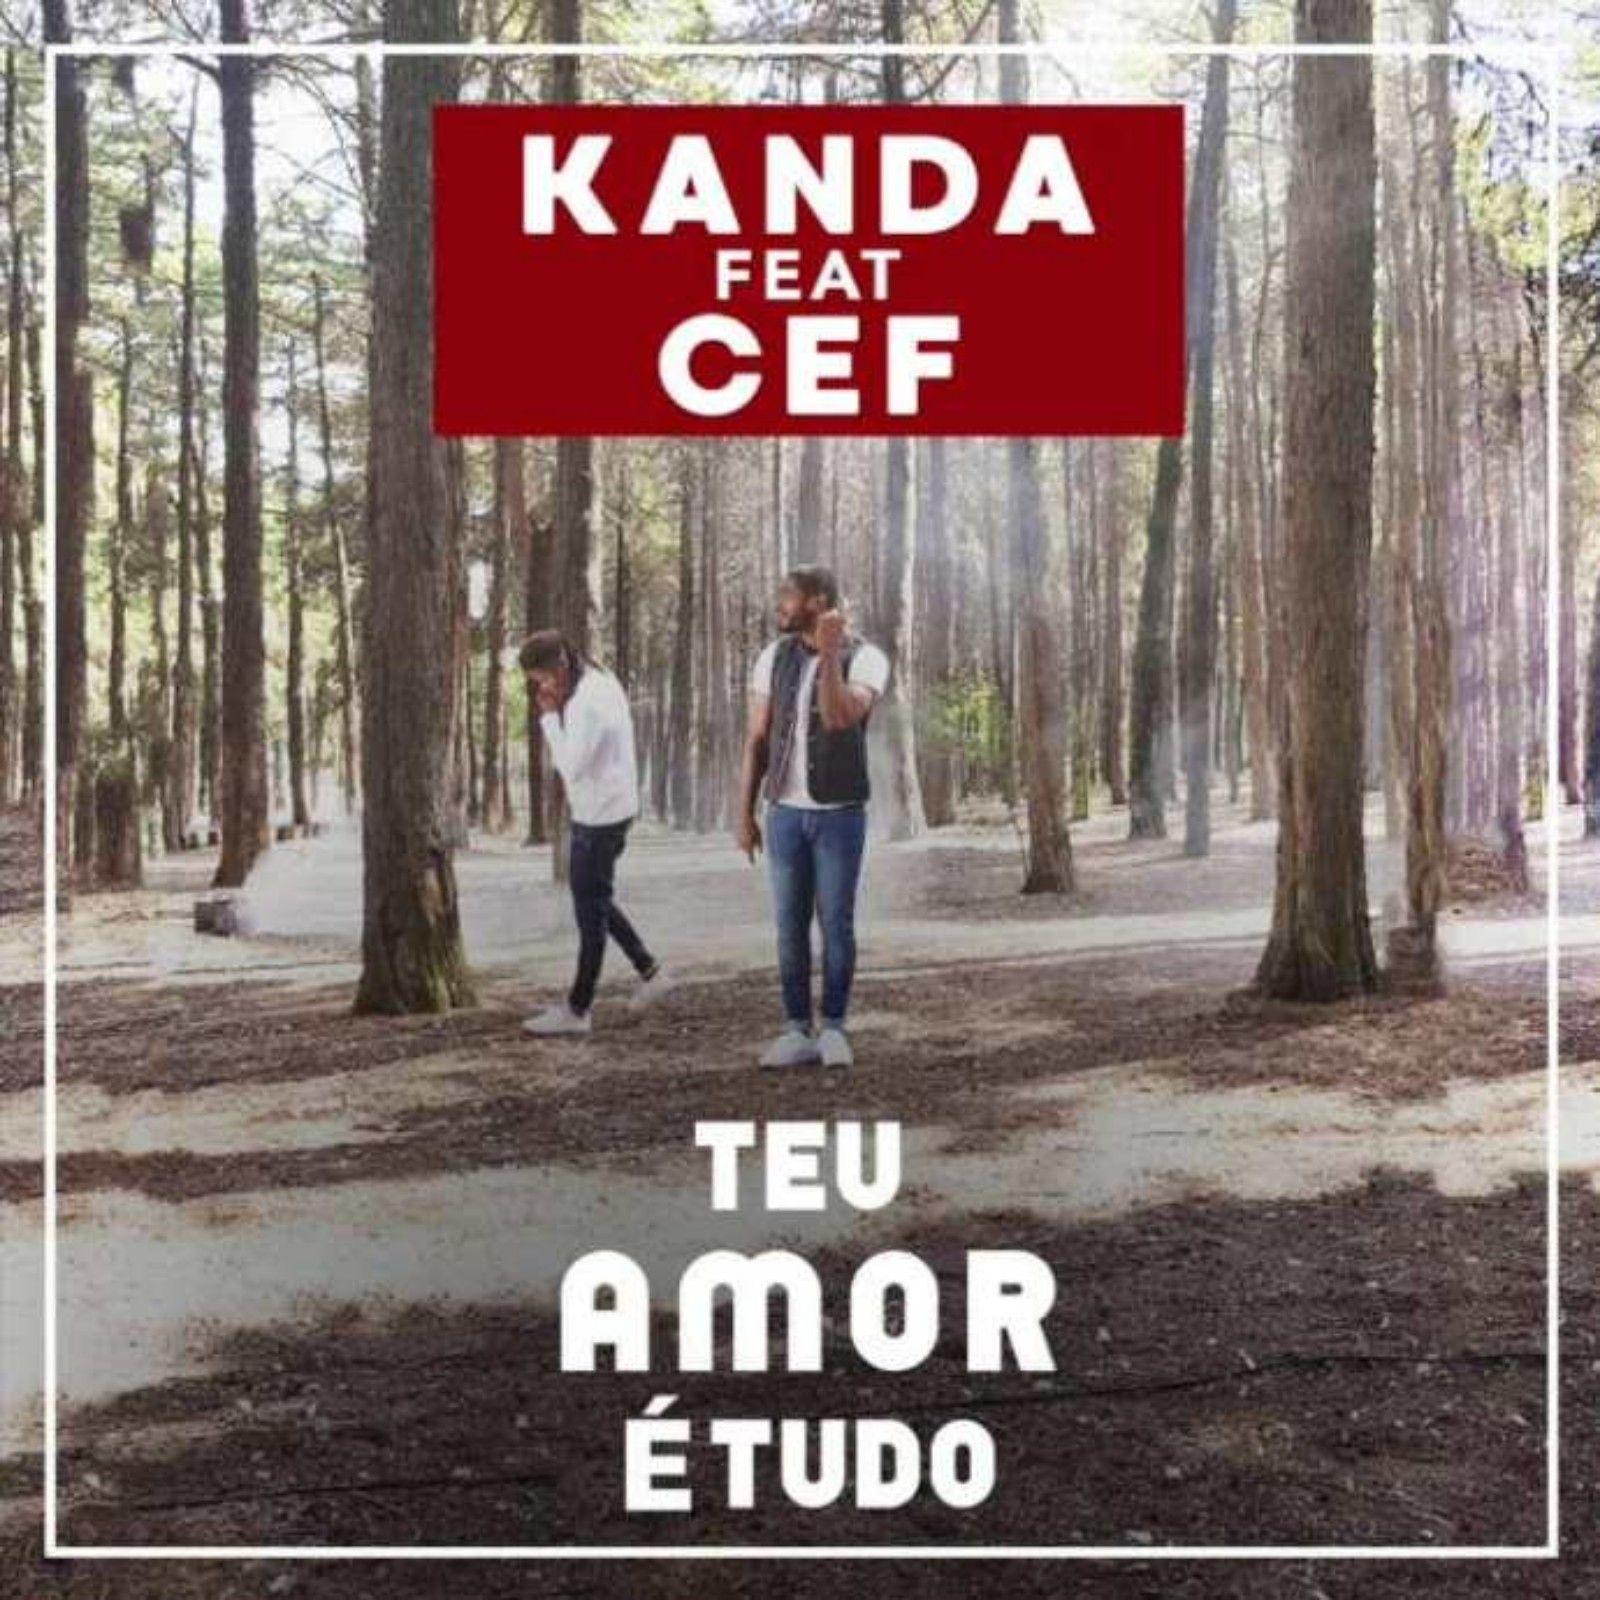 Kanda Feat Cef Teu Amor E Tudo Prod Mad Super Star 2019 Com